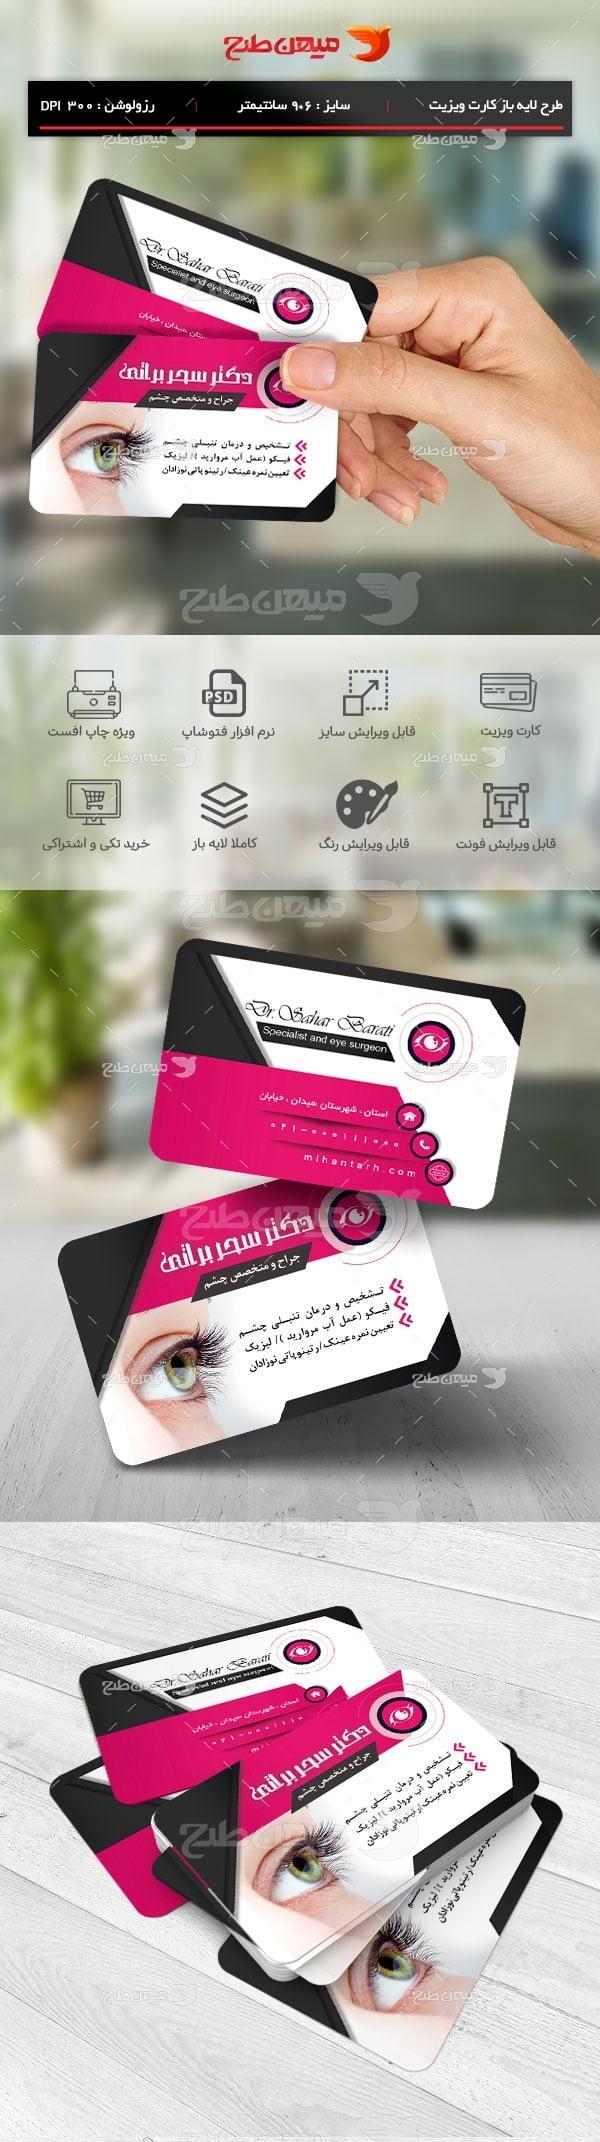 طرح لایه باز کارت ویزیت چشم پزشکی